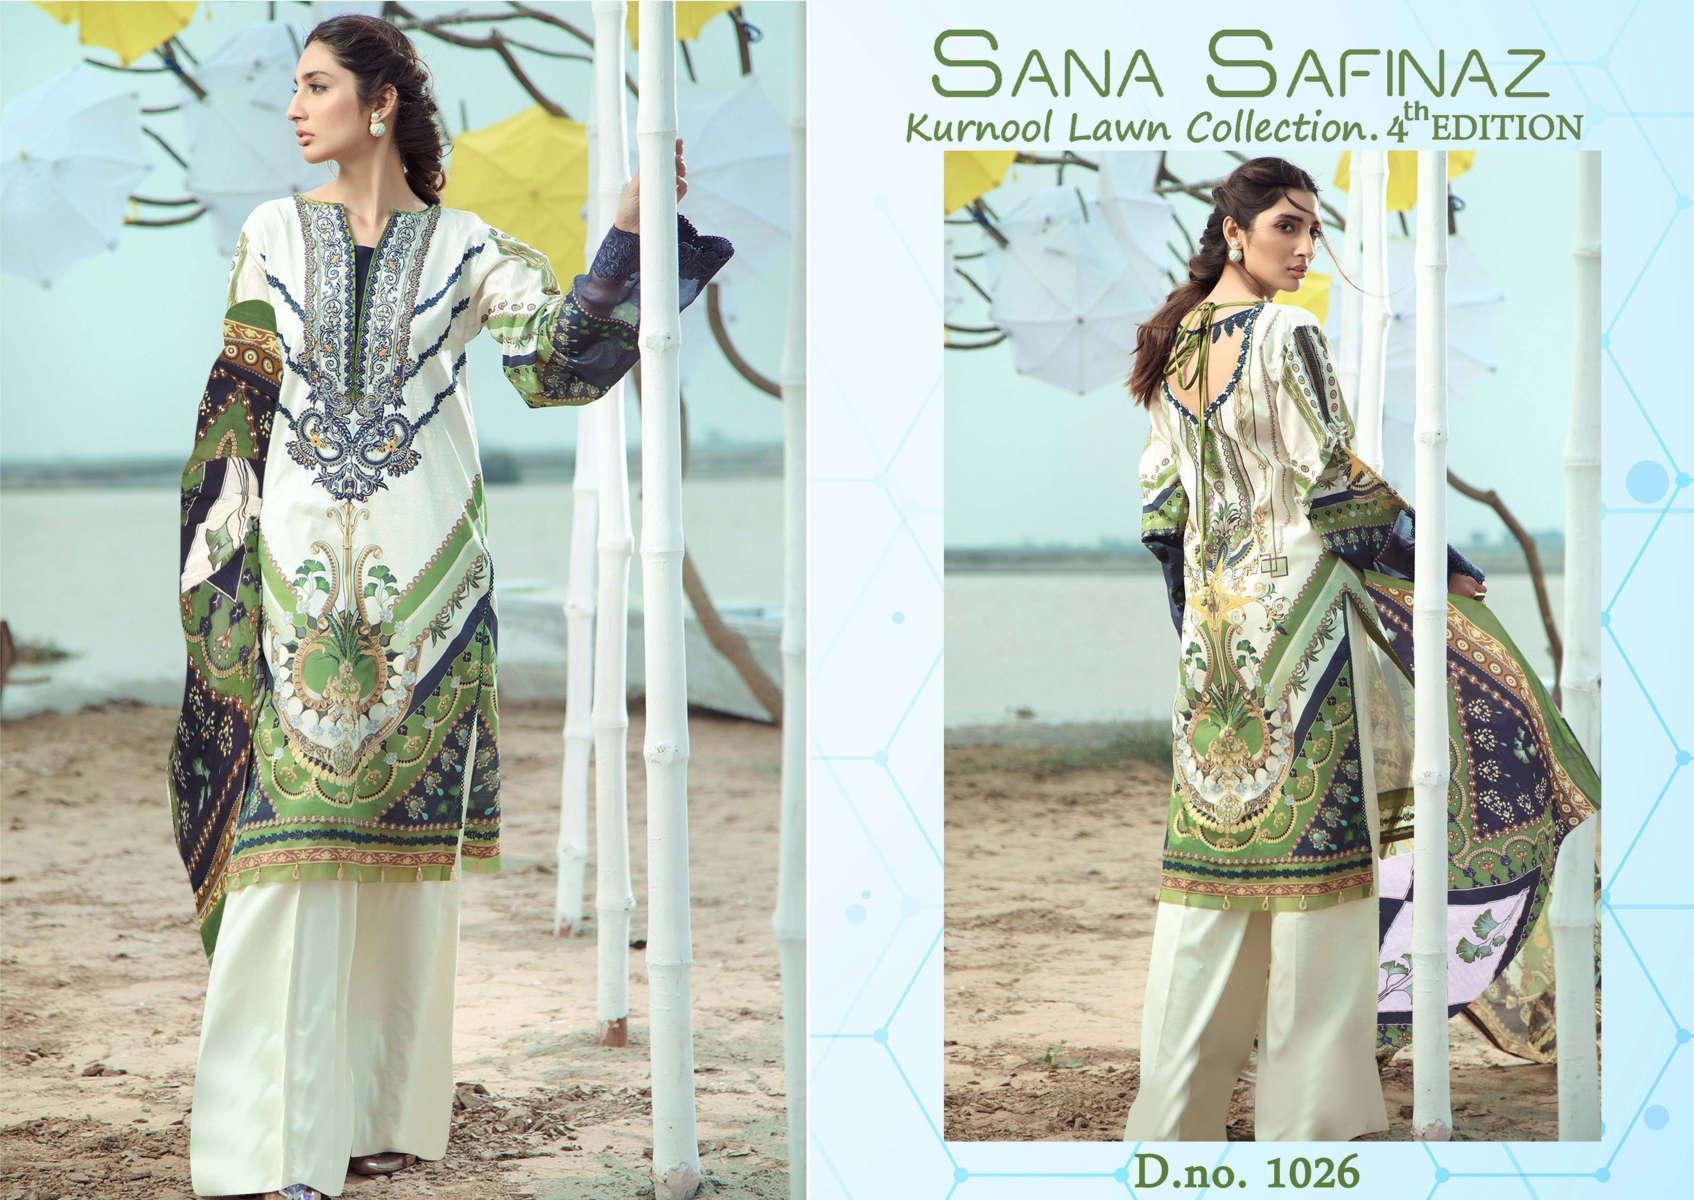 Sana Safinaz Kurnool Lawn Collection Vol 4 th Edition Salwar Suit Wholesale Catalog 4 Pcs 4 - Sana Safinaz Kurnool Lawn Collection Vol 4 th Edition Salwar Suit Wholesale Catalog 4 Pcs